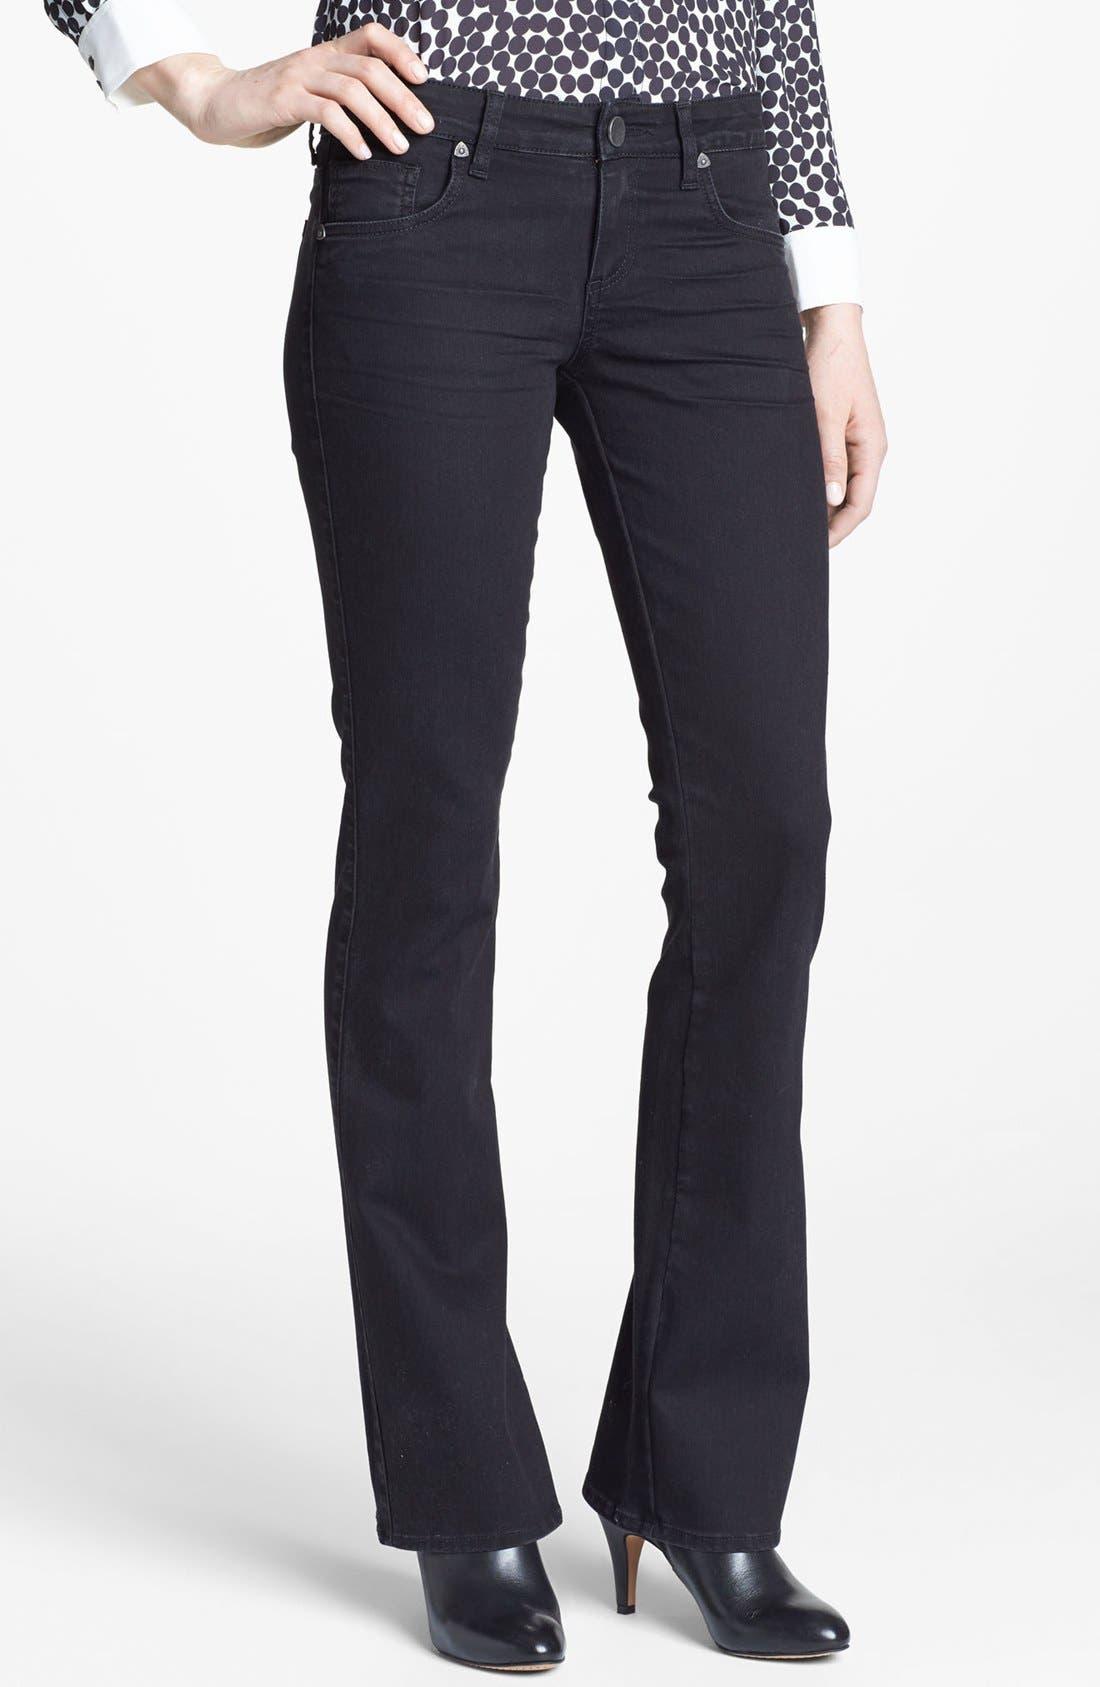 Alternate Image 1 Selected - KUT from the Kloth Farrah' Mini Bootcut Jeans (Black)